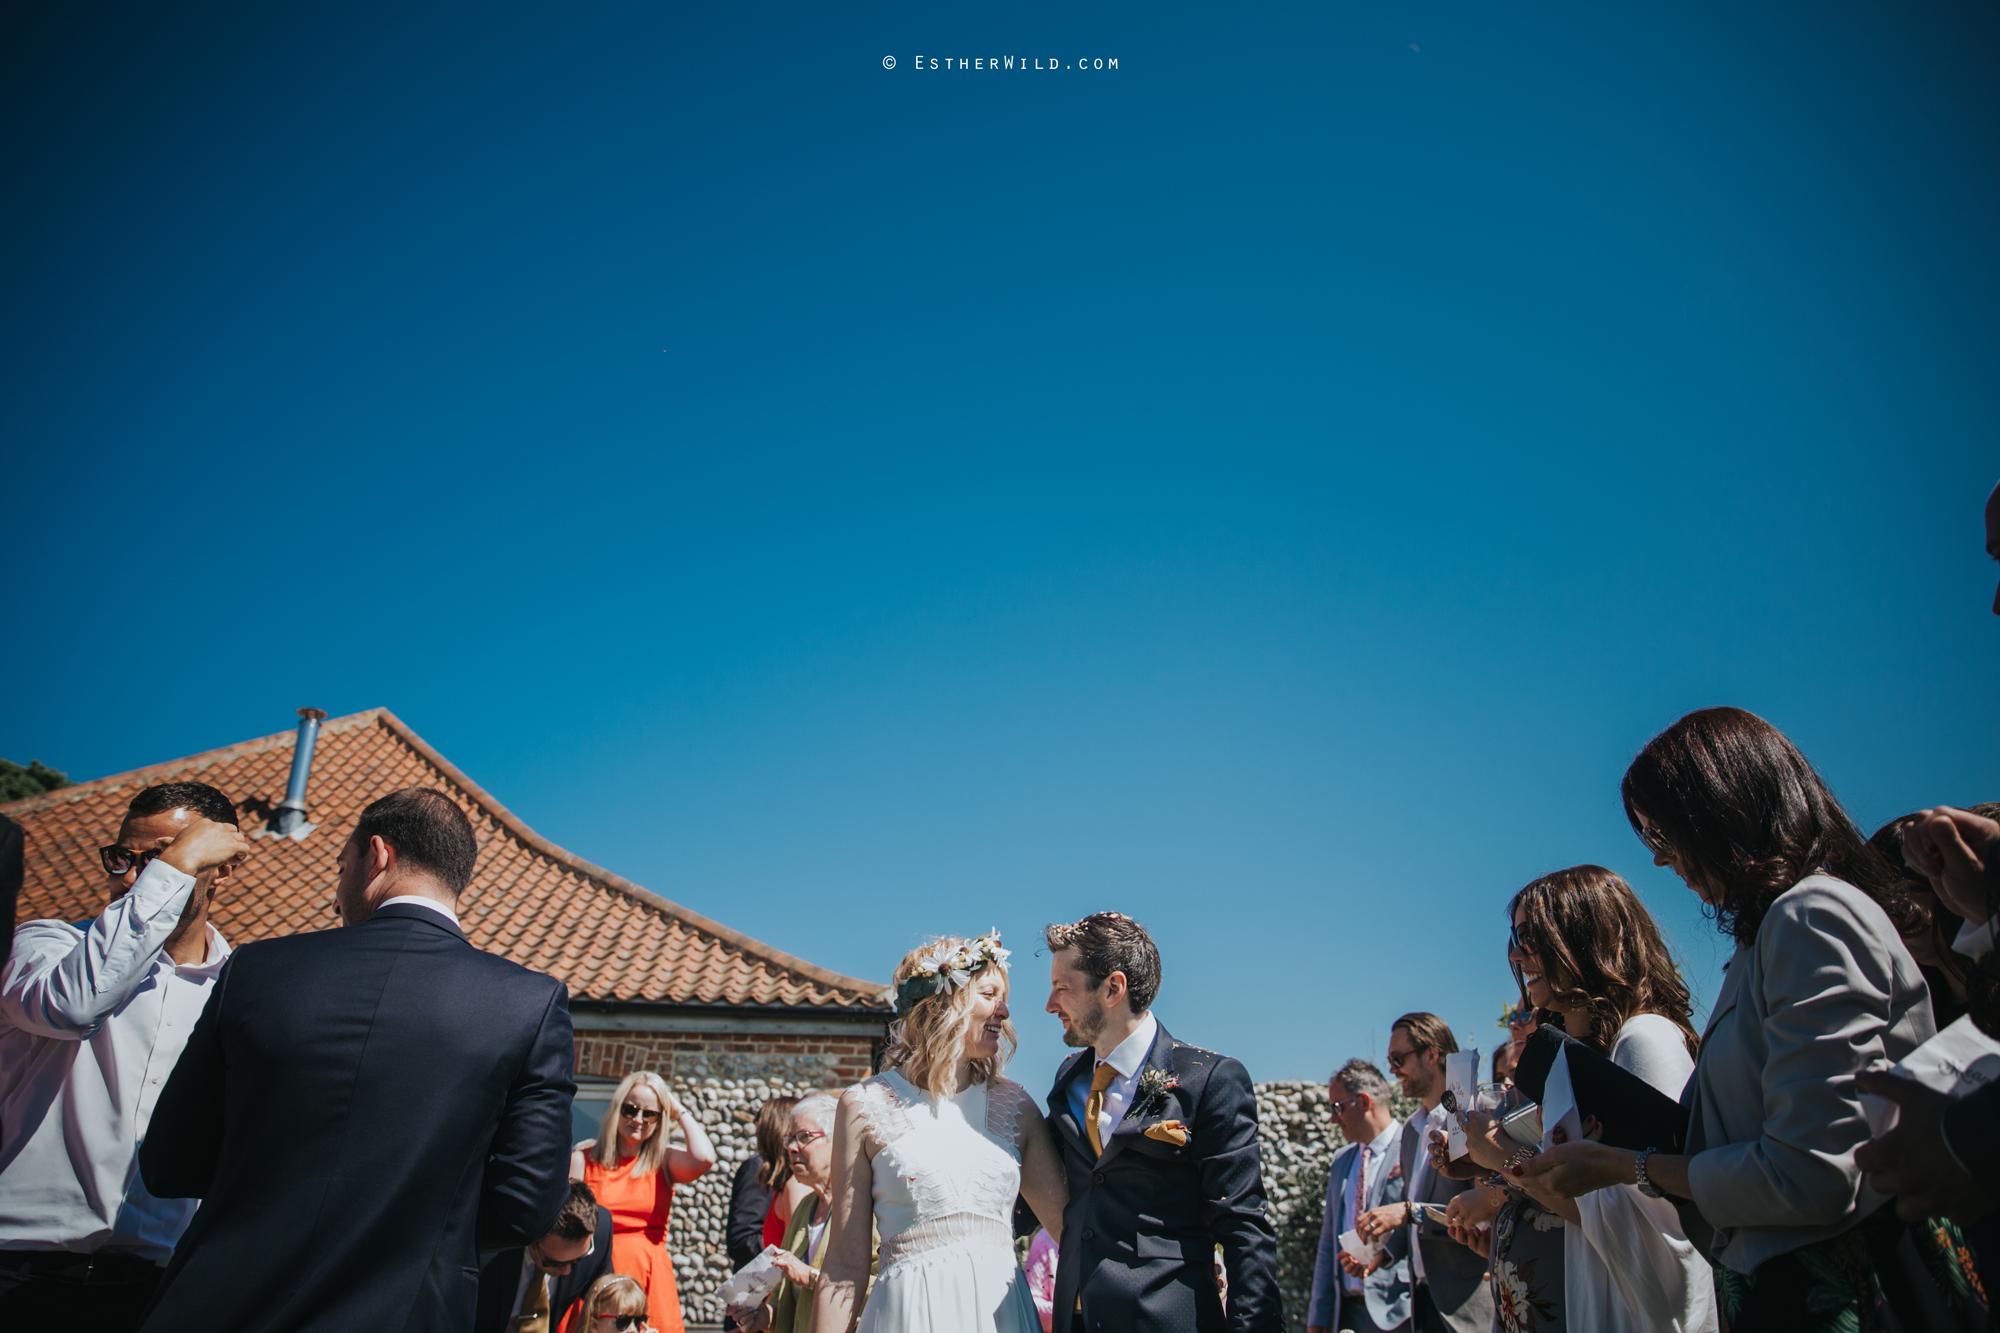 IMG_0815Cley_Barn_Drift_Norfolk_Coast_Wedding_Copyright_Esther_Wild_Photographer_.jpg